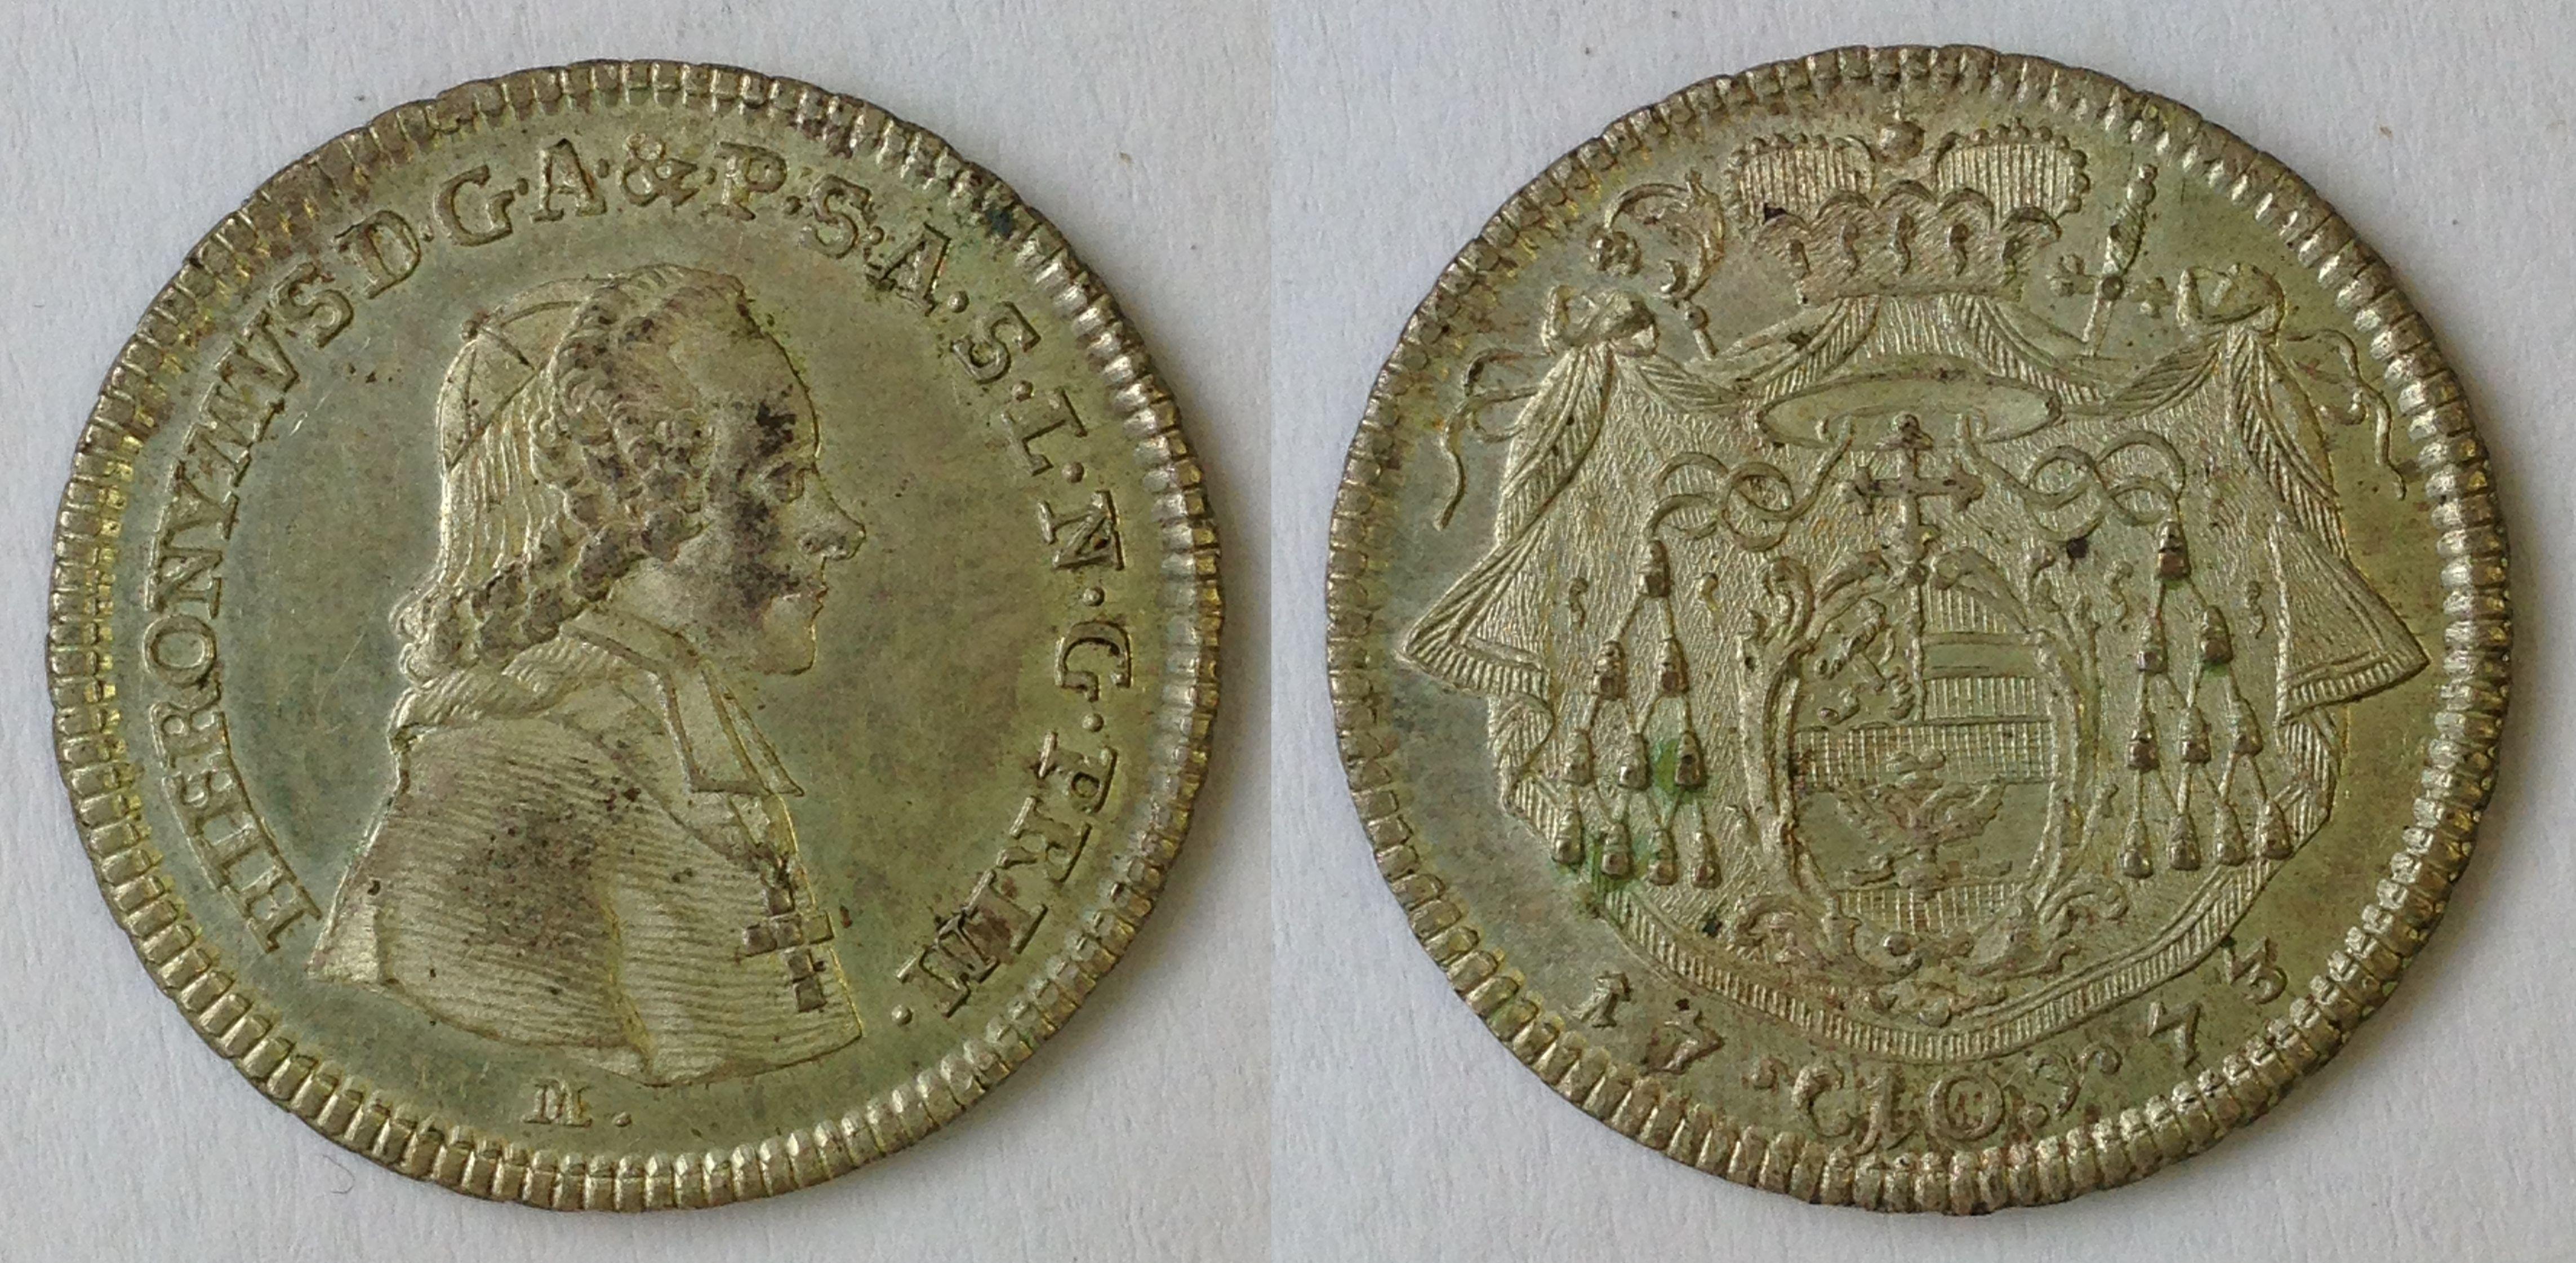 10 Kreuzer 1773, Münzkabinett Prag